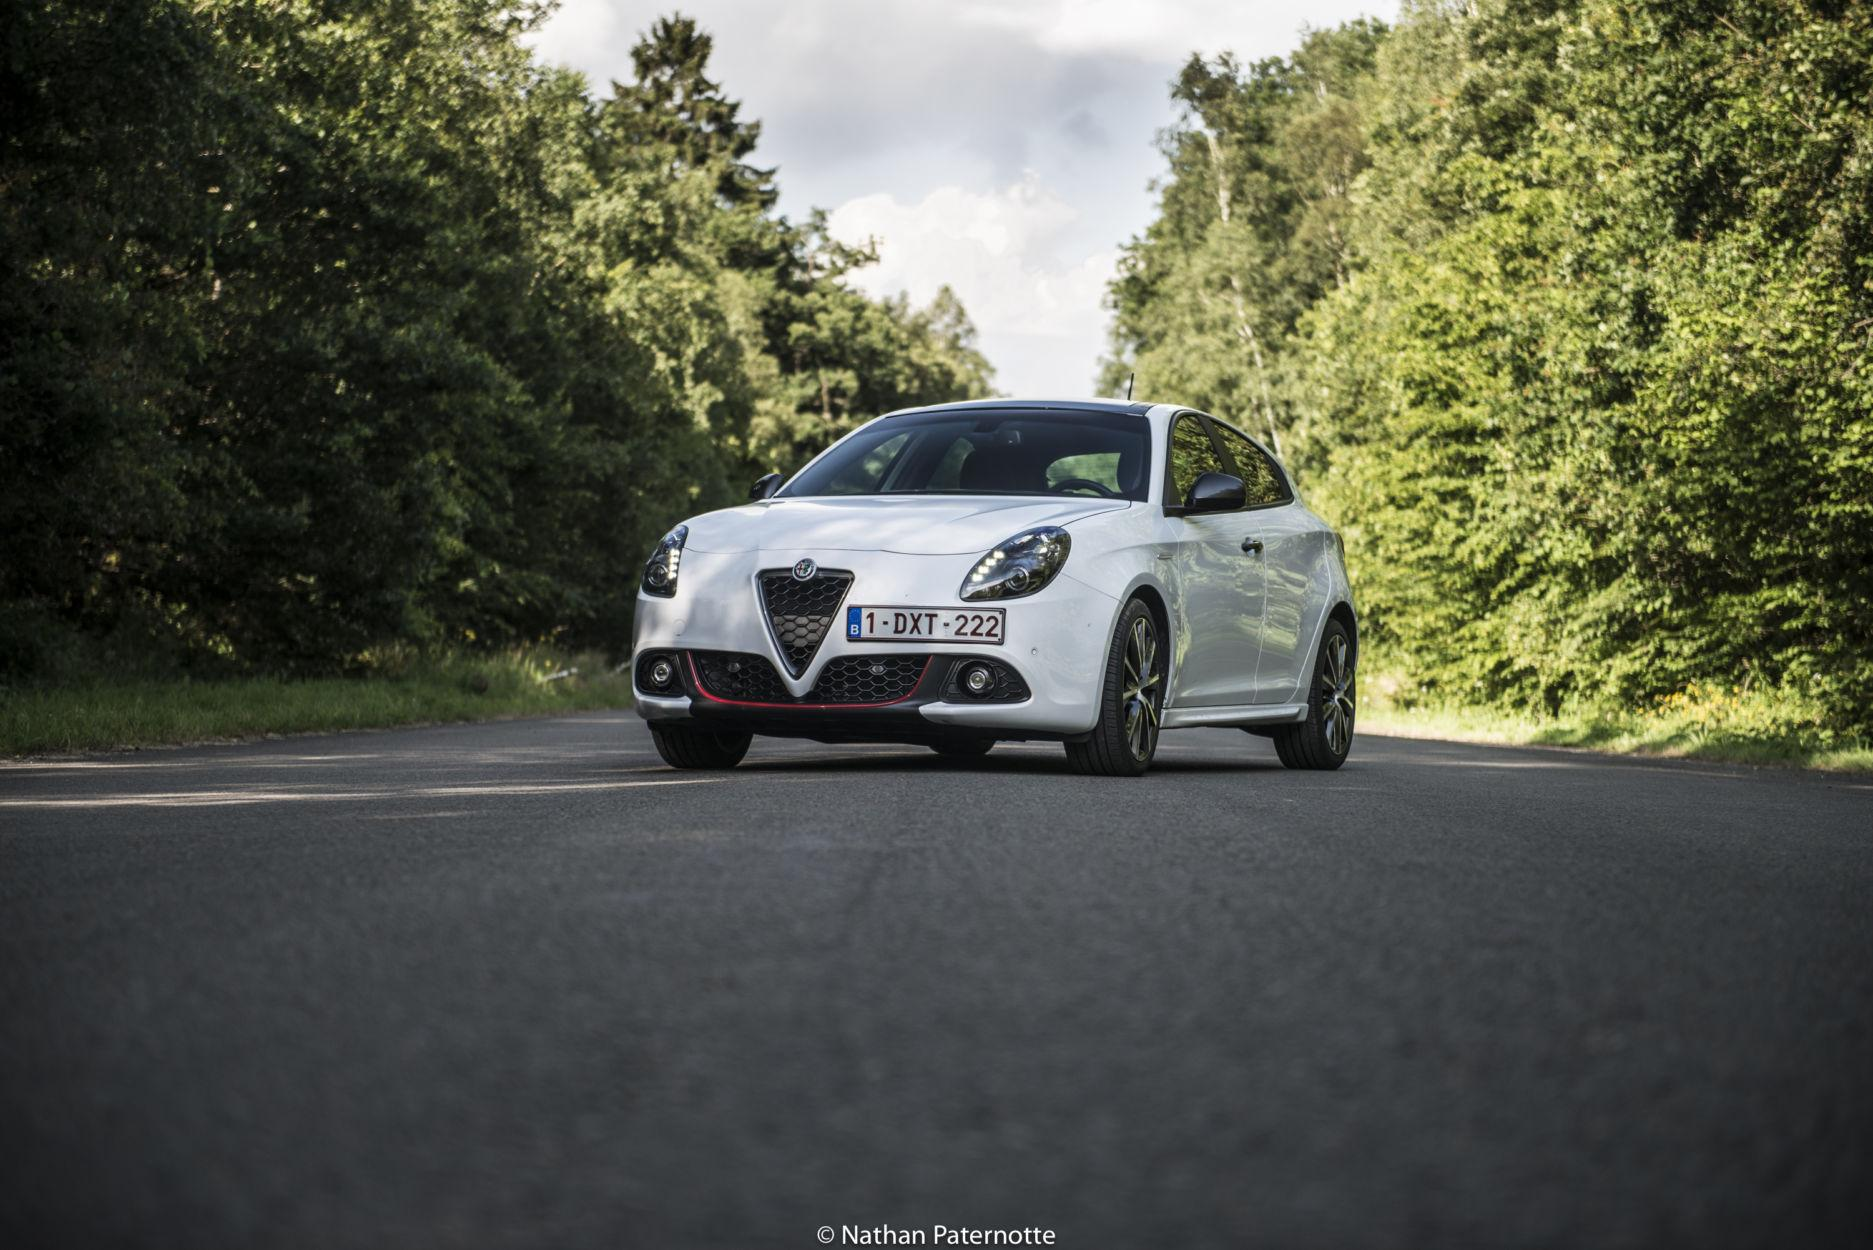 Photo de Essai : Alfa Romeo Giulietta 1.6 JTDm TCT 120cv Veloce